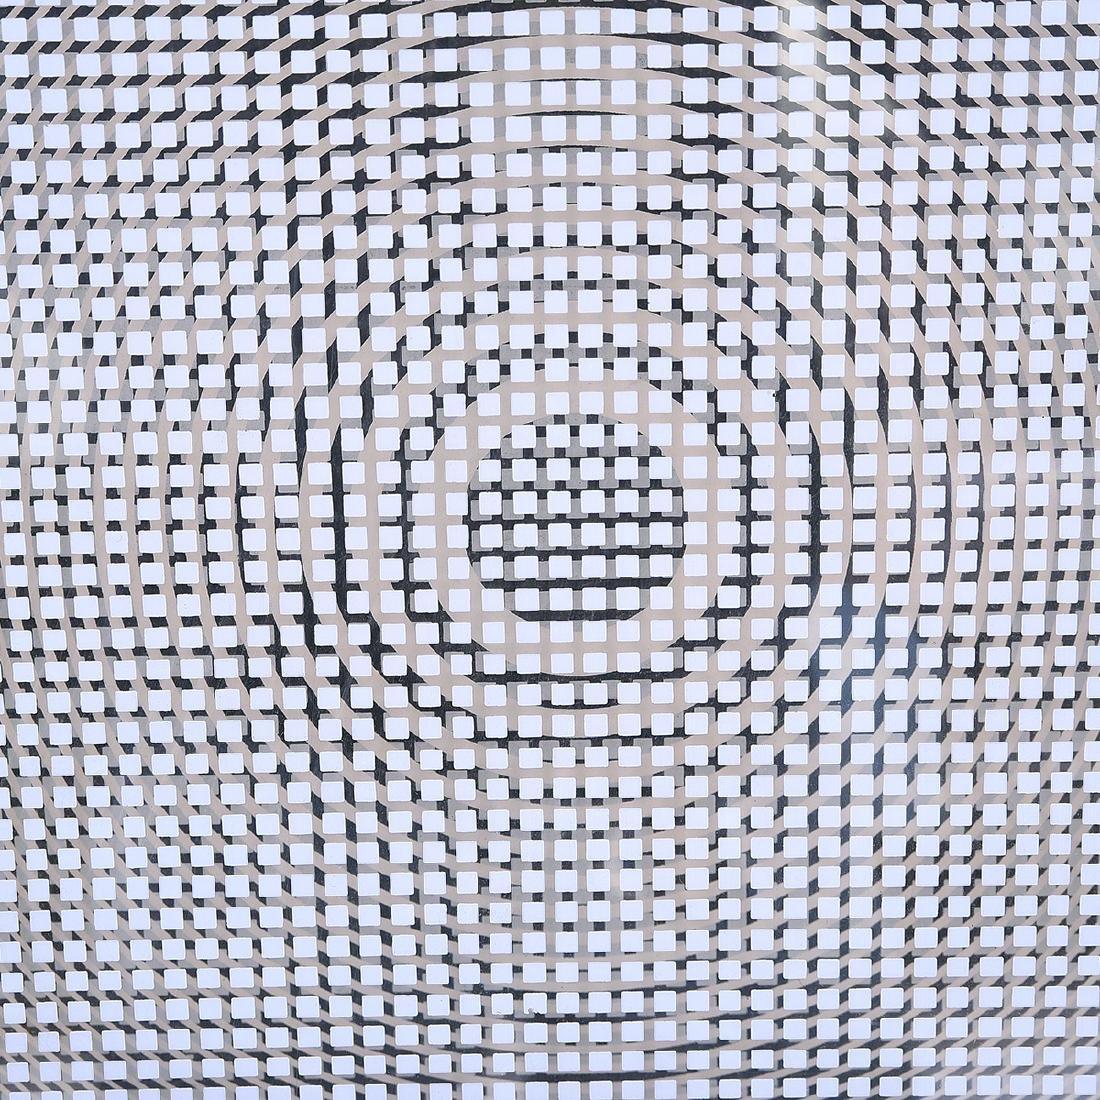 Attrib. to Alberto Biasi, Untitled double silkscreen - 4